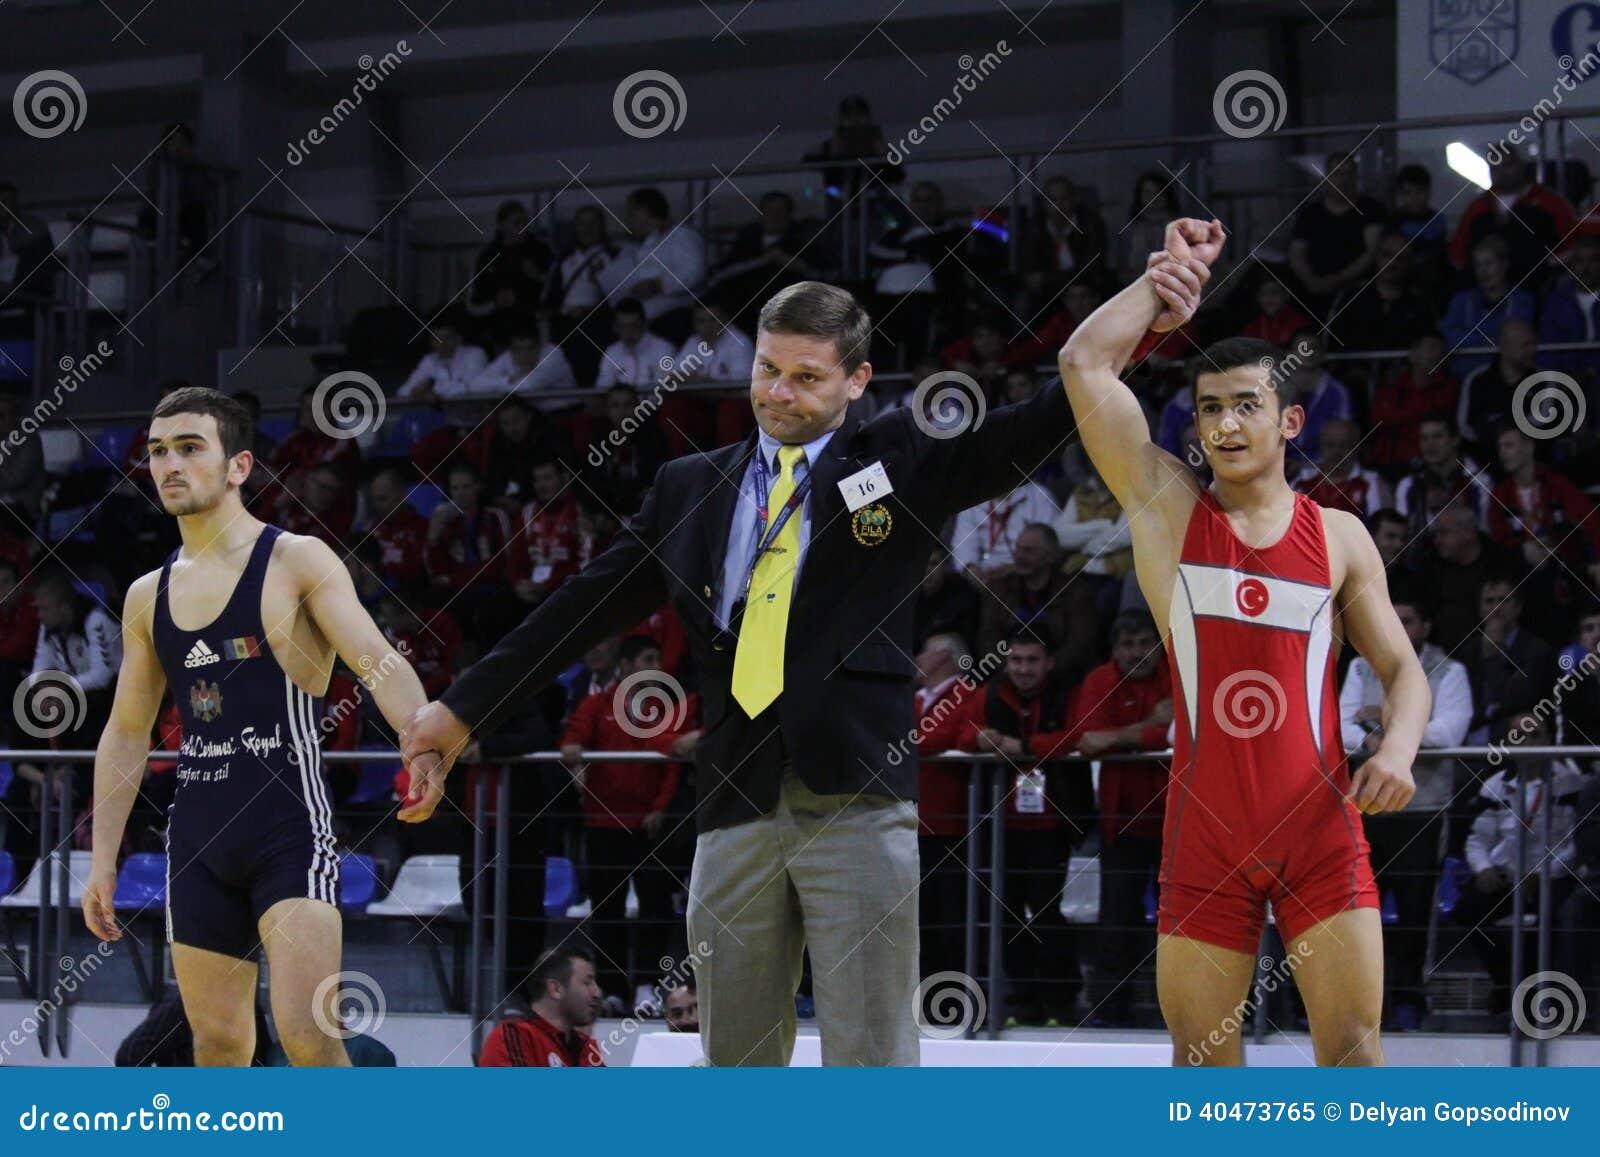 2014 European cadet wrestling championship